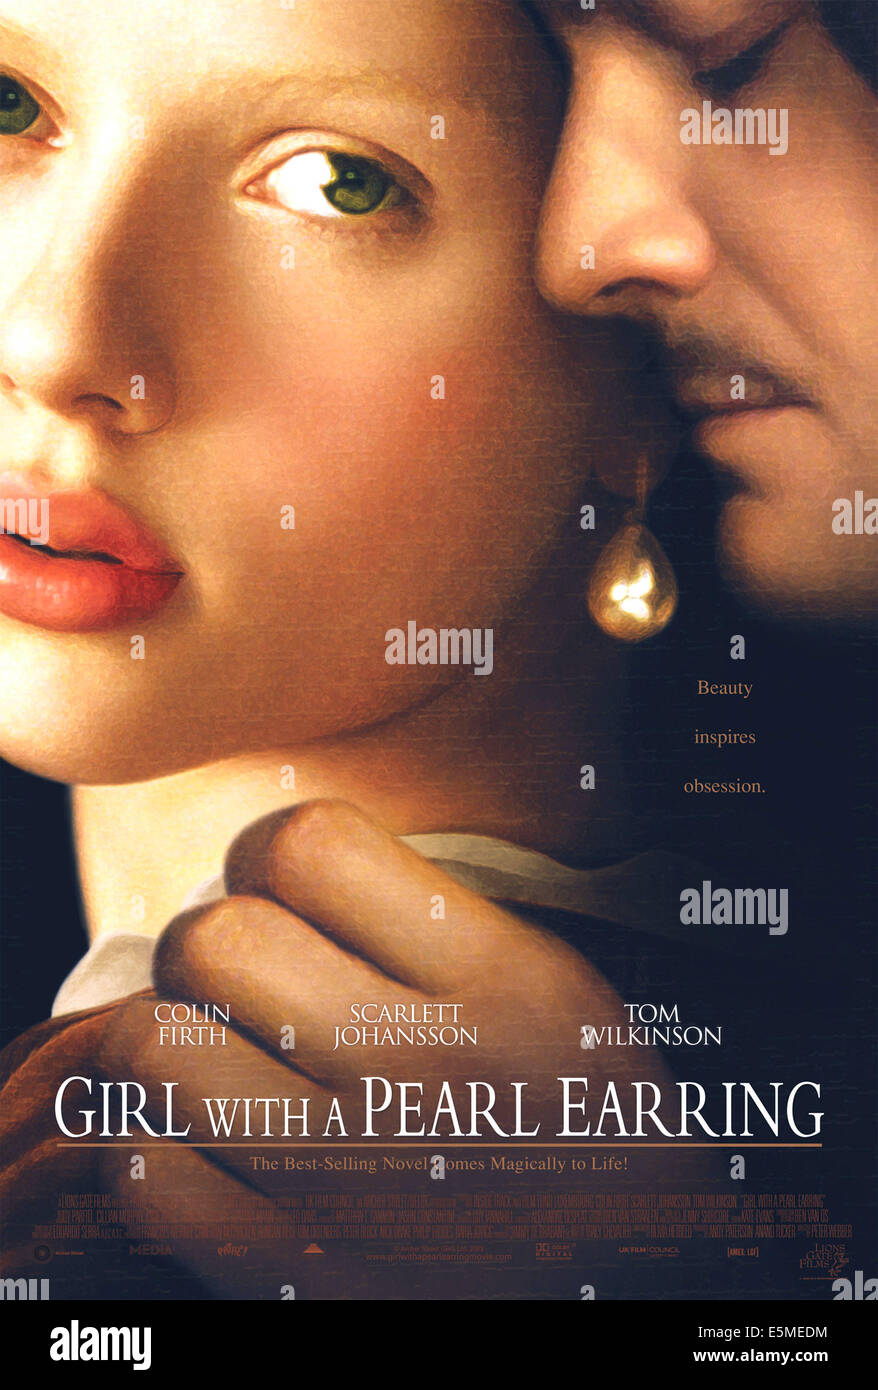 girl pearl earring 2003 scarlett stock photos amp girl pearl